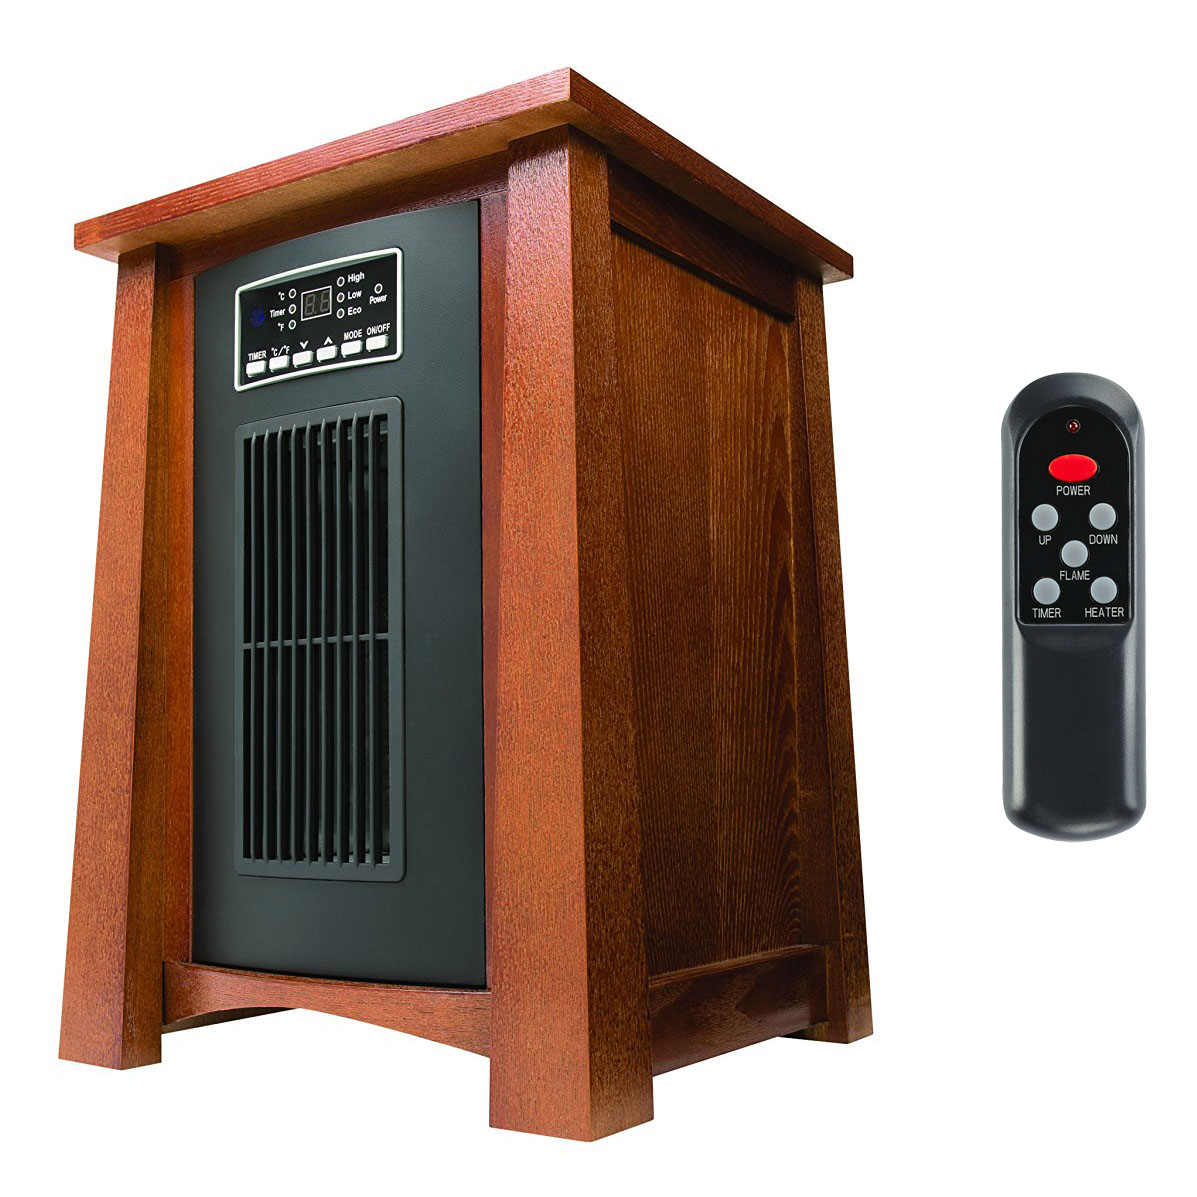 Haier 3 Setting 1500w 5100 Btu Infrared Heater W Oak